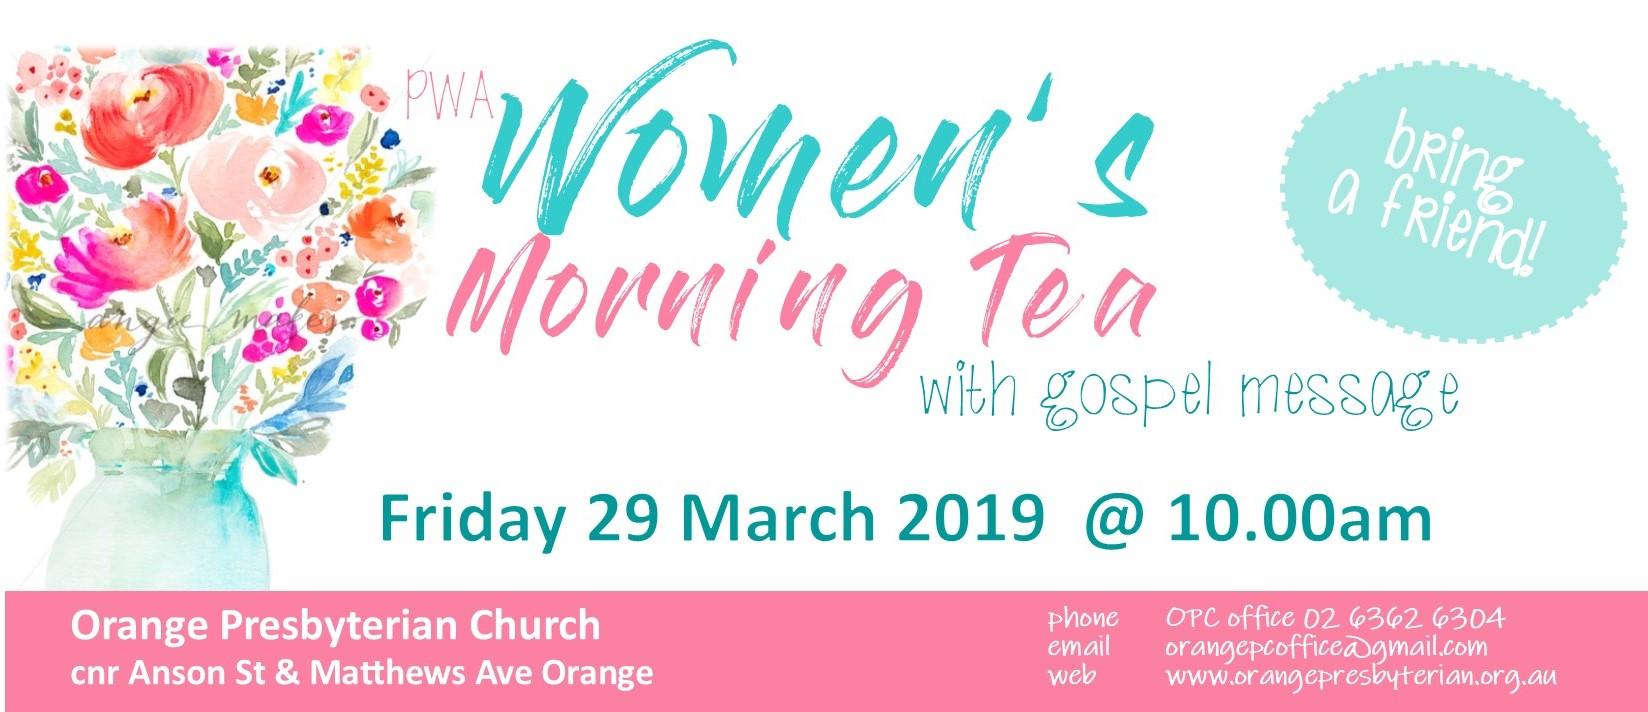 02 womens morning tea.jpg